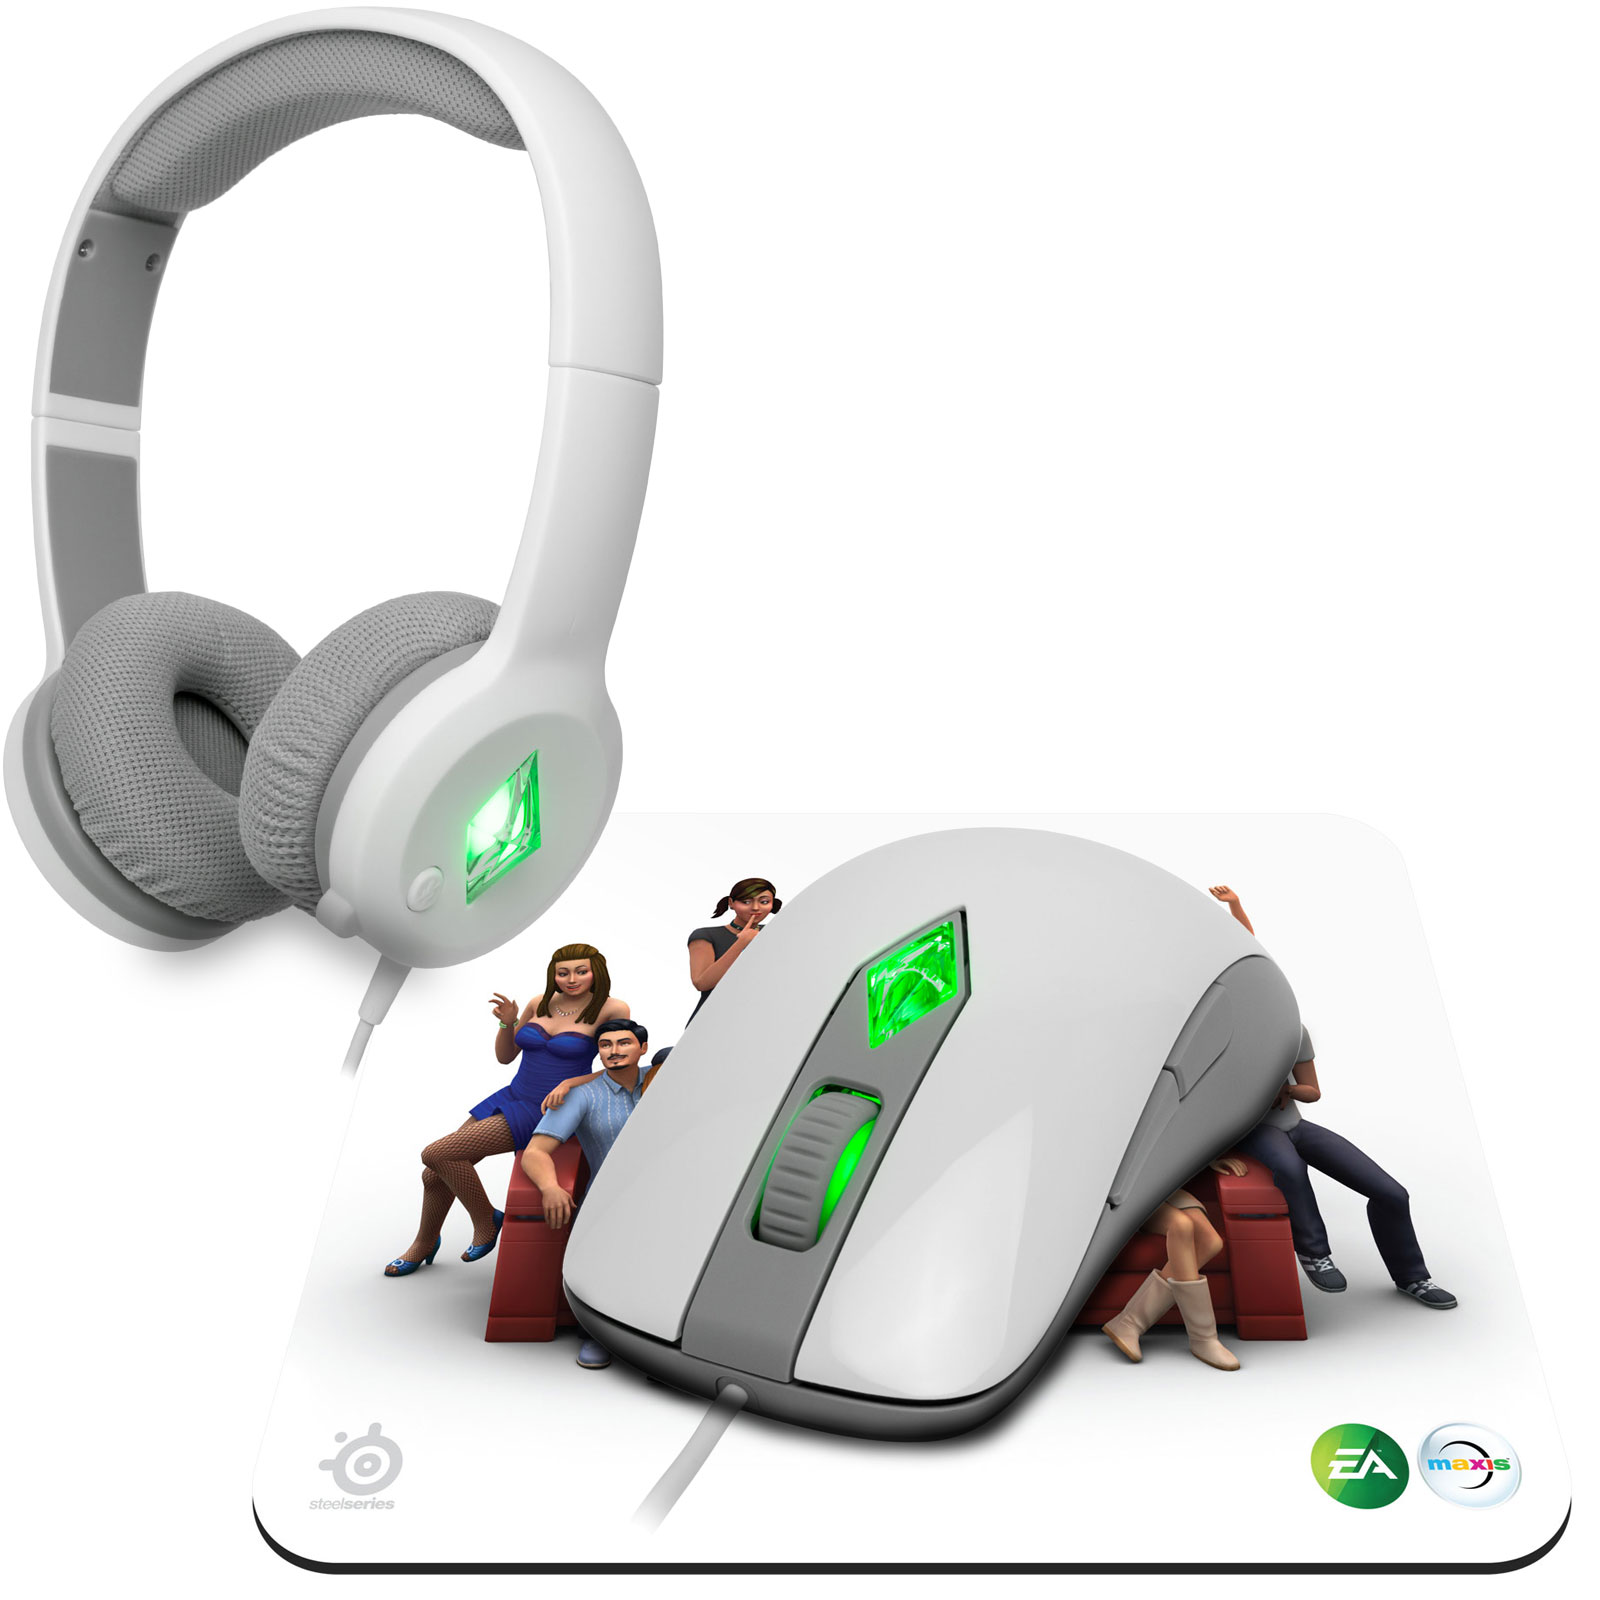 Souris PC SteelSeries The Sims 4 Gaming Pack Souris laser + casque-micro + tapis de souris pour gamer